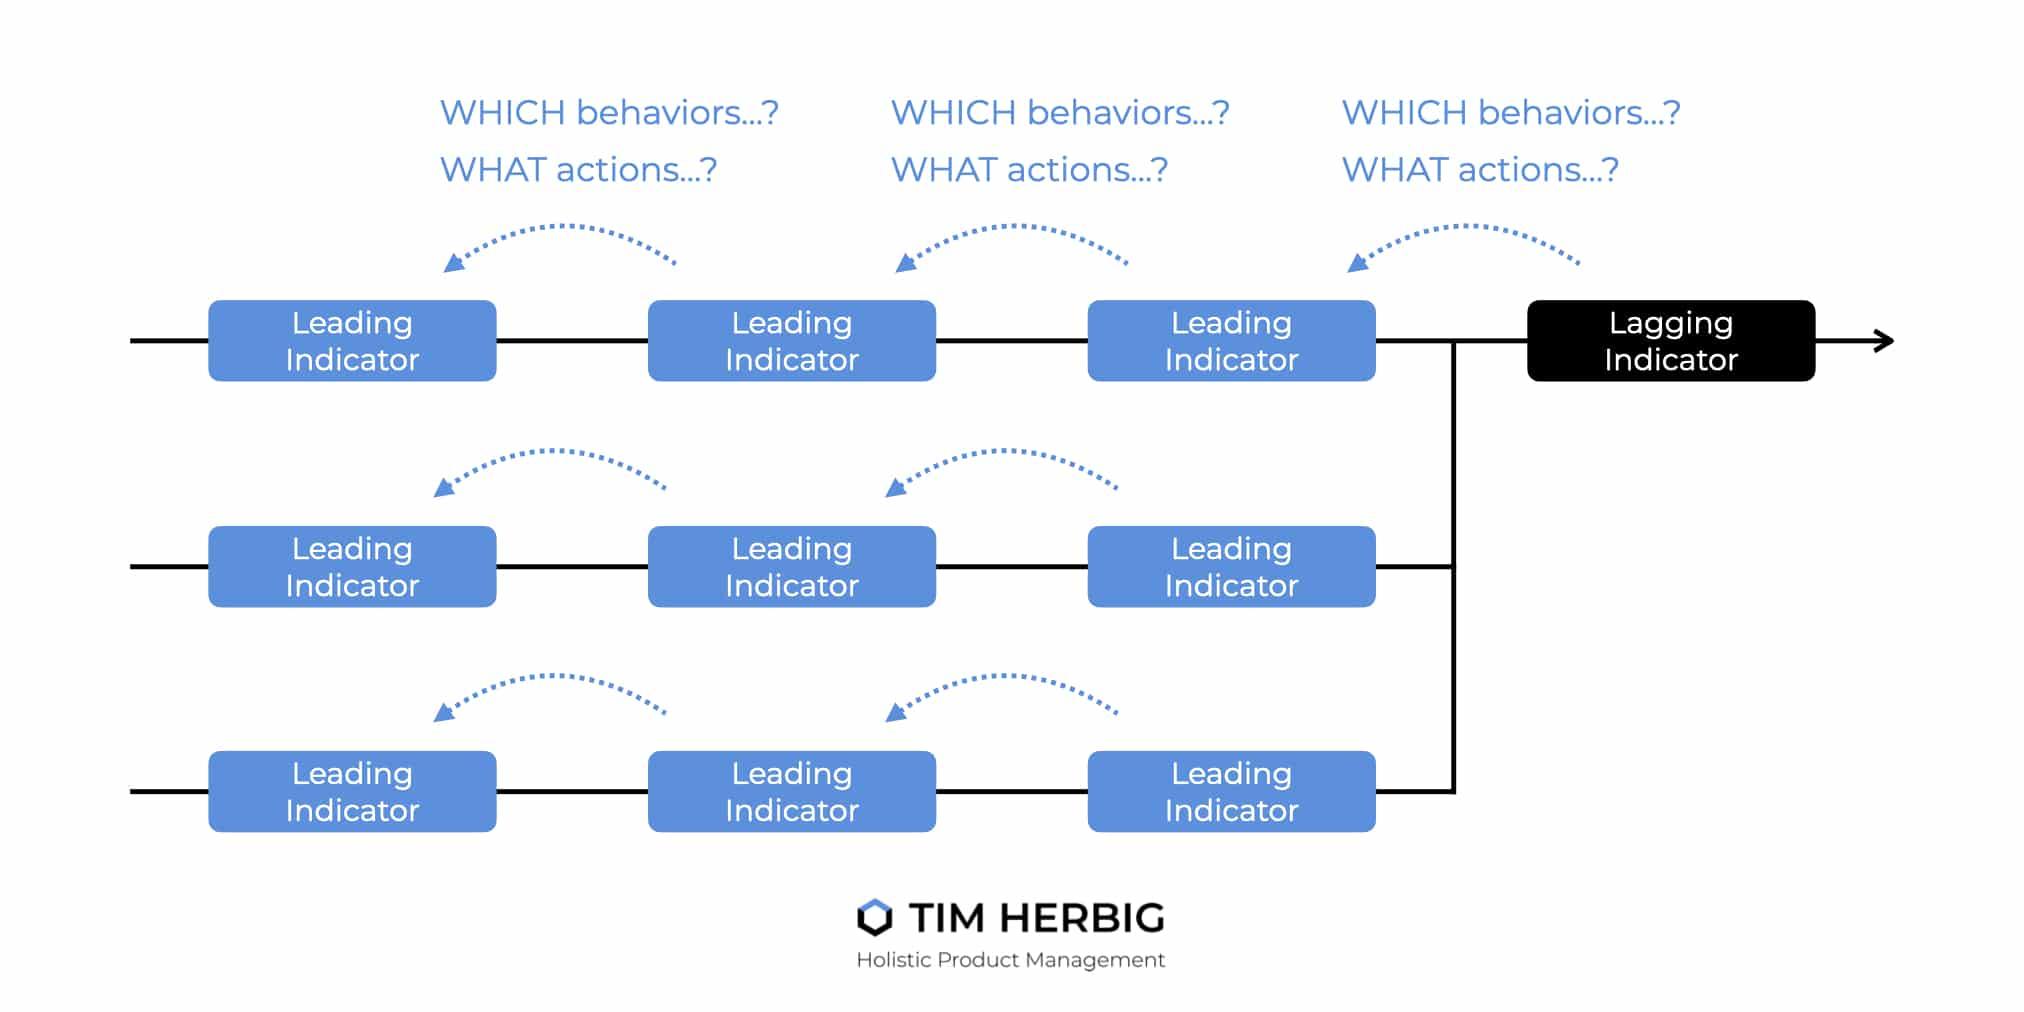 Working Backwards to identify Leading Indicators Process